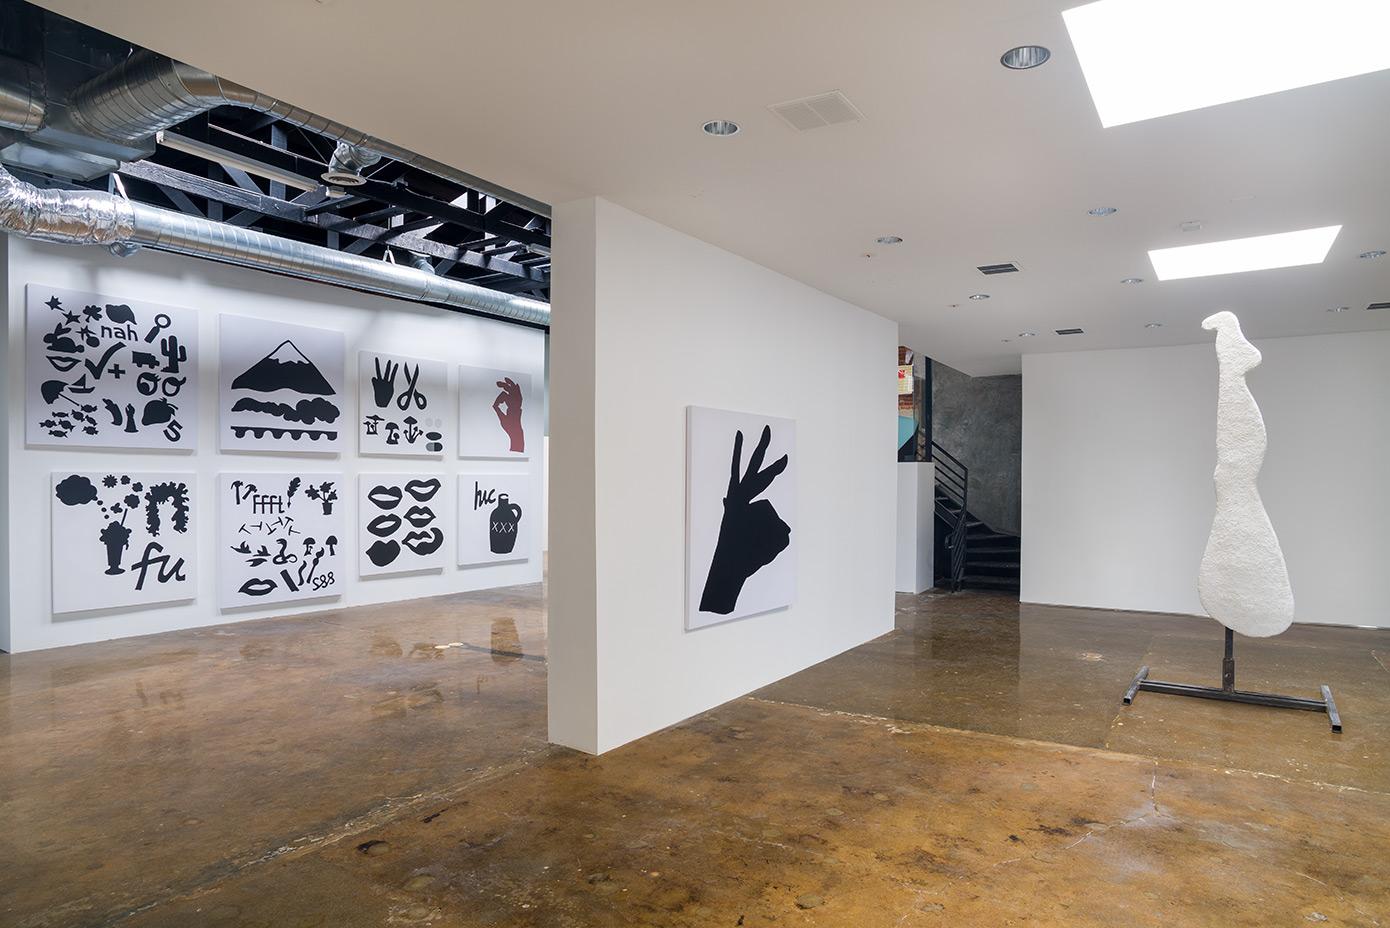 Drawings at LA ART Los Angeles 2015